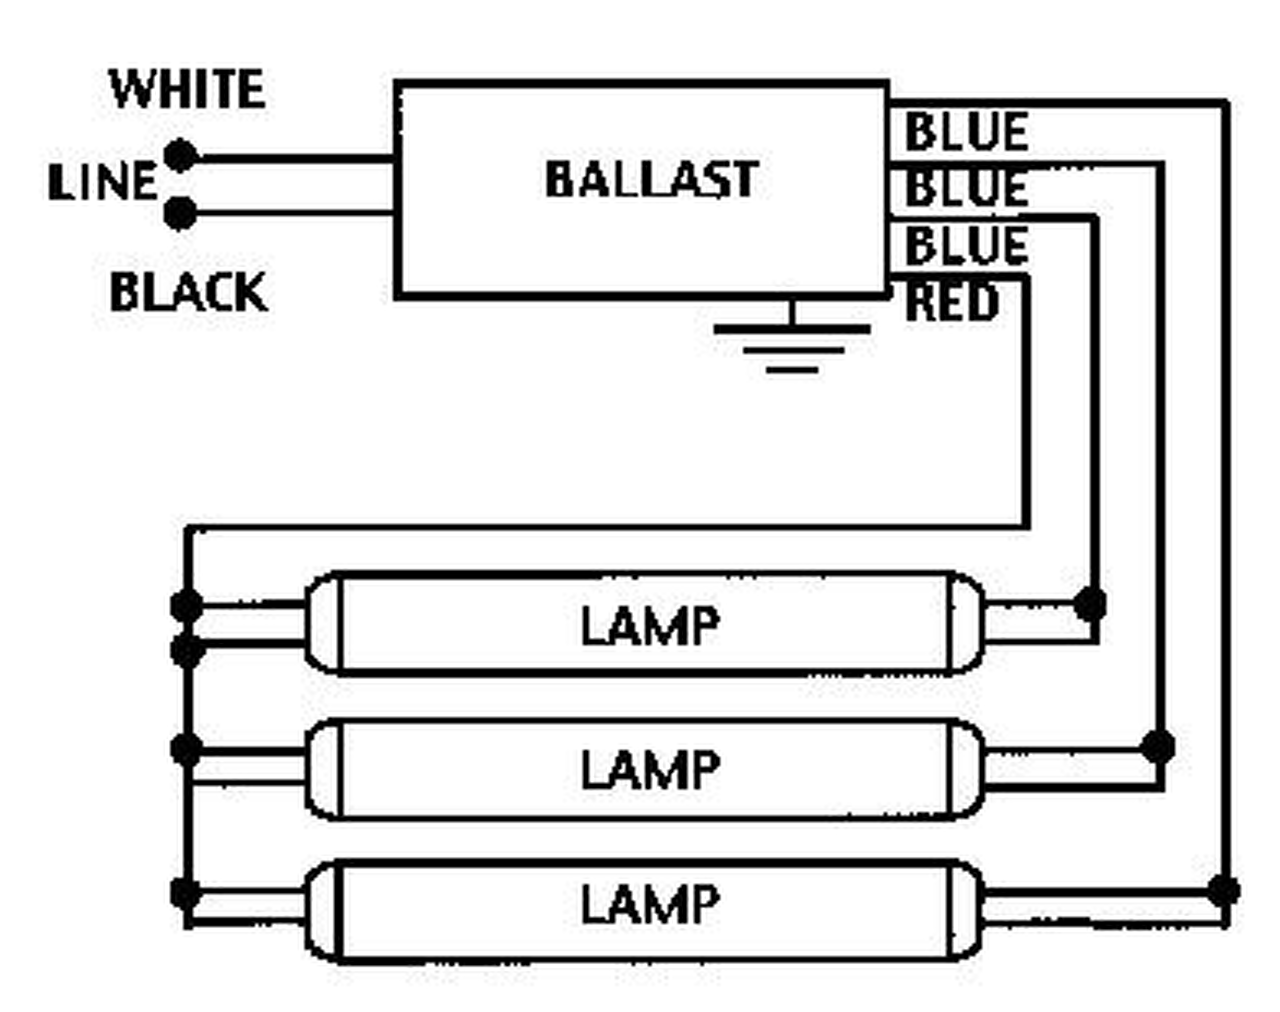 GE332MAX-G-N (Replaces GE-332-MV-N) GE 74456 UltraMax® Ballast on 4 light switch wiring diagram, 4 lamp t8 ballast wiring, ez wiring diagram, 4 speaker wiring diagram, 4 battery wiring diagram, lamp socket diagram, electronic ballast circuit diagram, ice cube relay wiring diagram, charging system diagram, ballast 2 4 lamp diagram, 4 led wiring diagram,